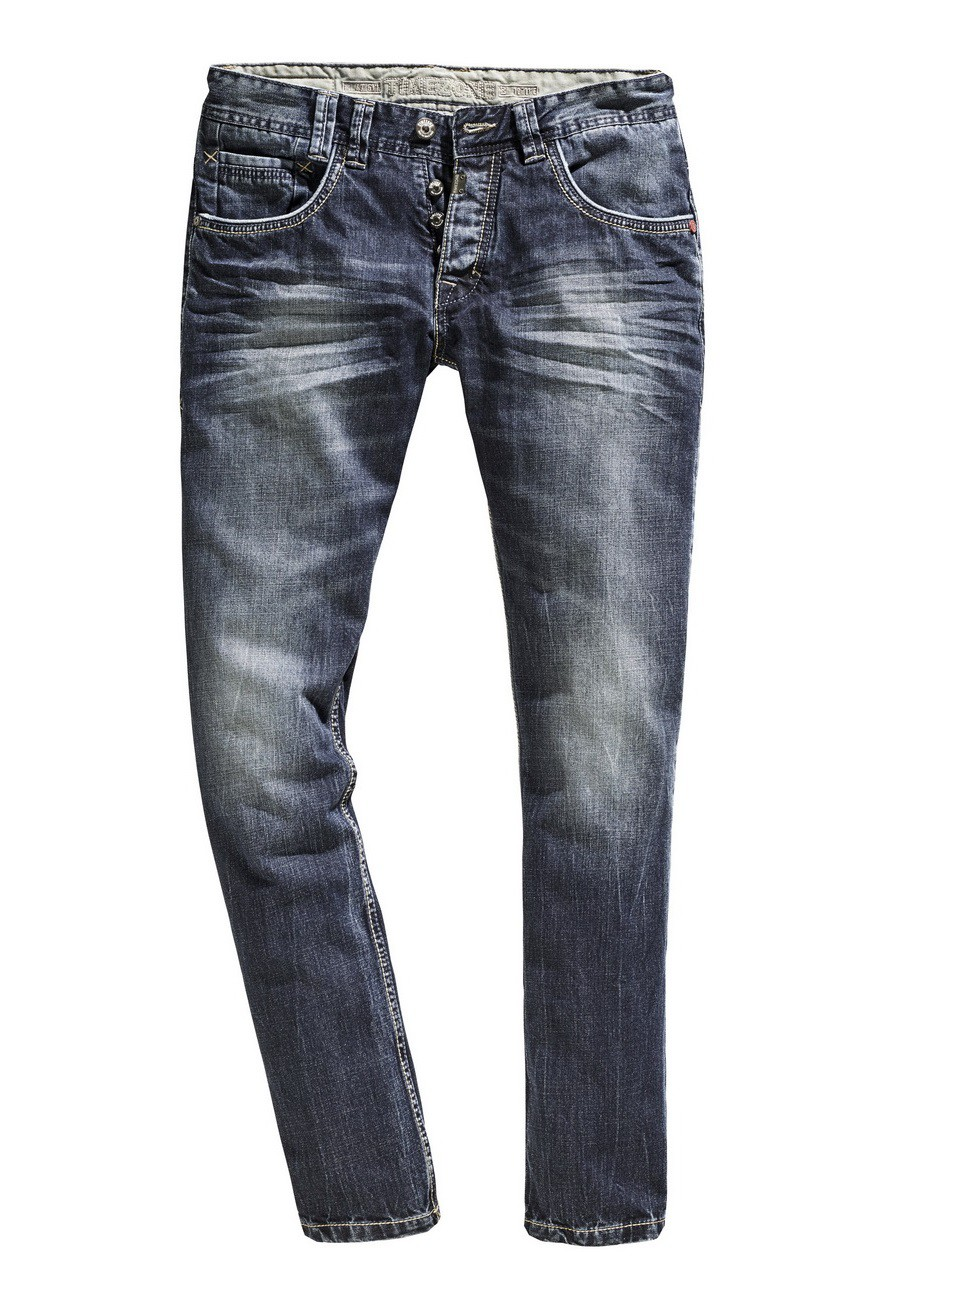 timezone herren jeans gerrittz regular fit blau. Black Bedroom Furniture Sets. Home Design Ideas